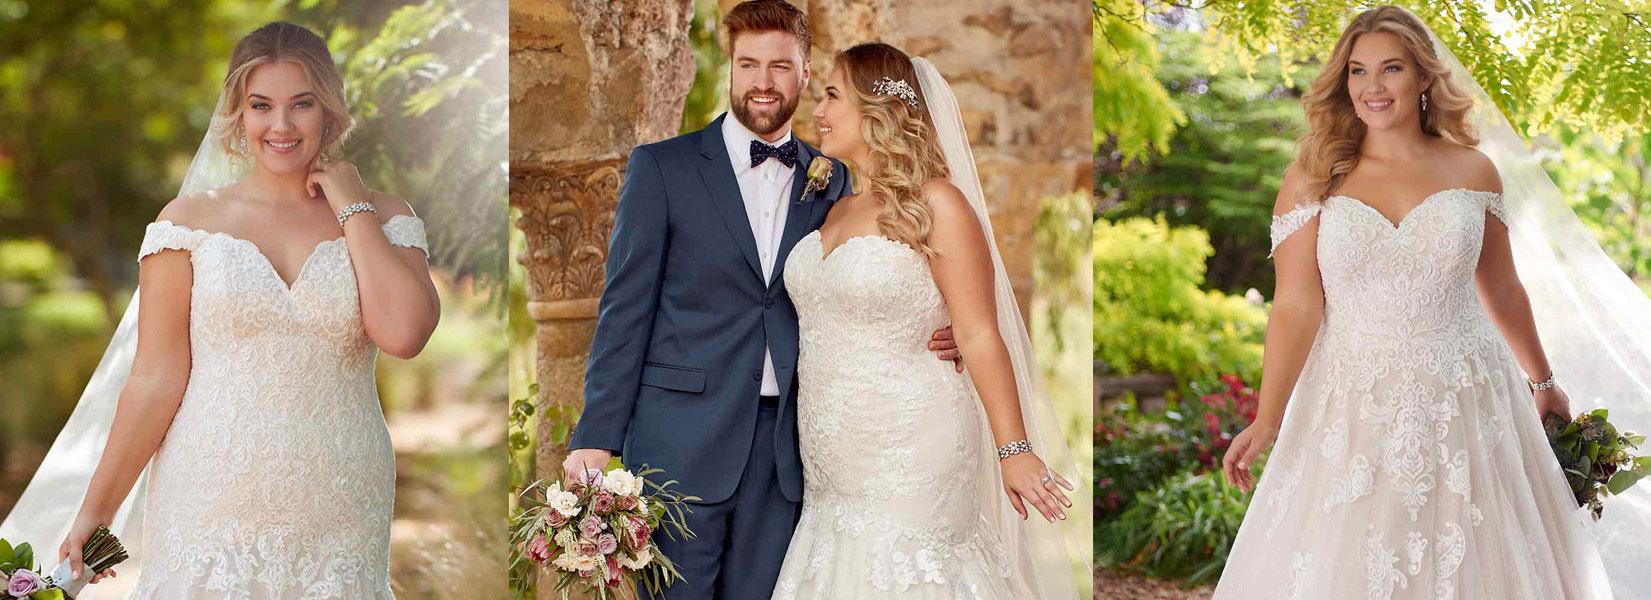 new york bride plus size wedding dresses